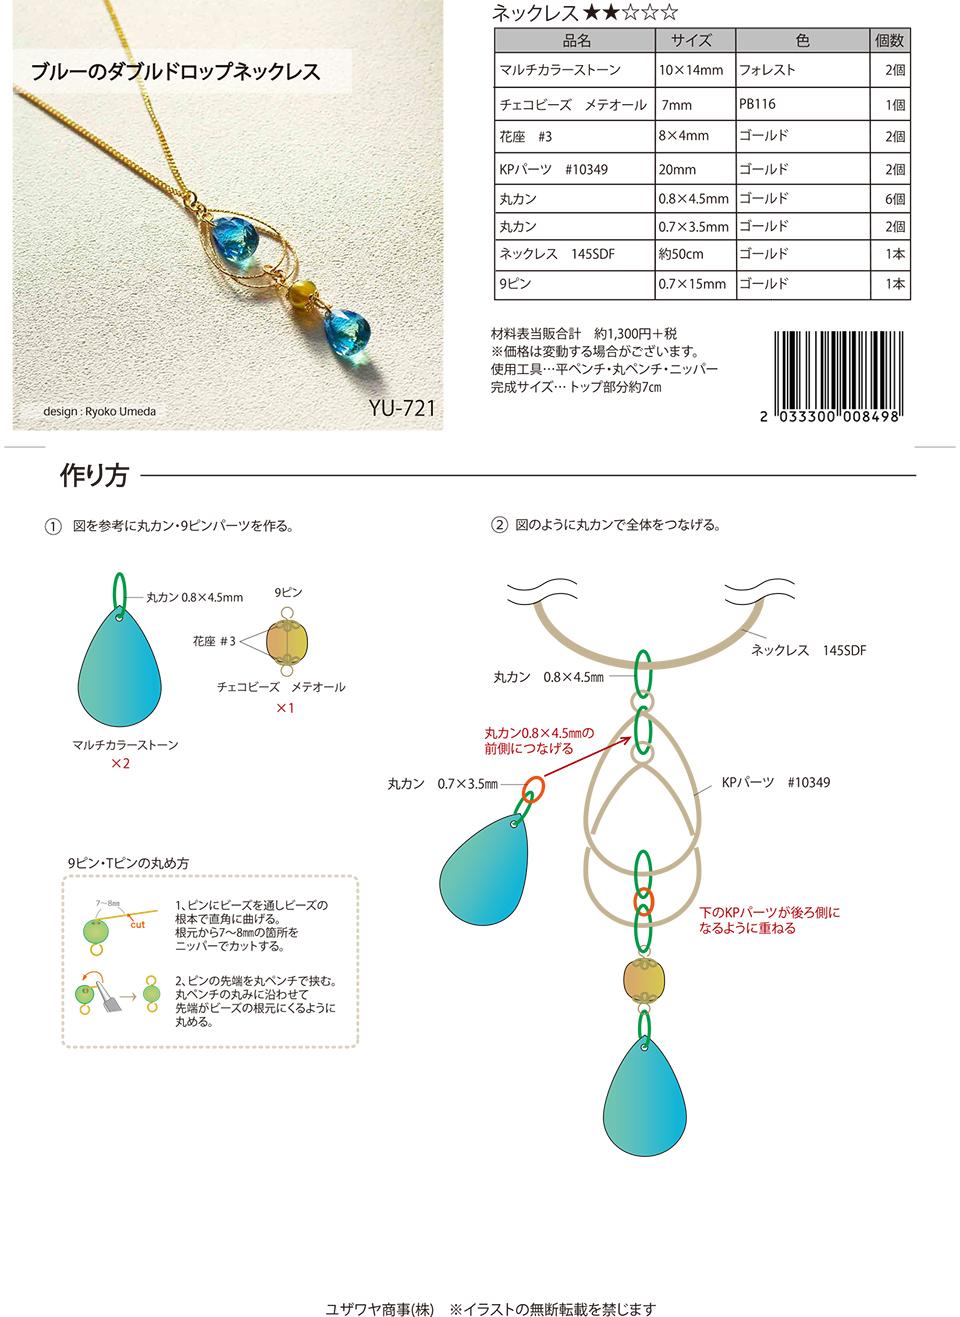 YU-721ブルーのダブルドロップネックレス_1.jpg